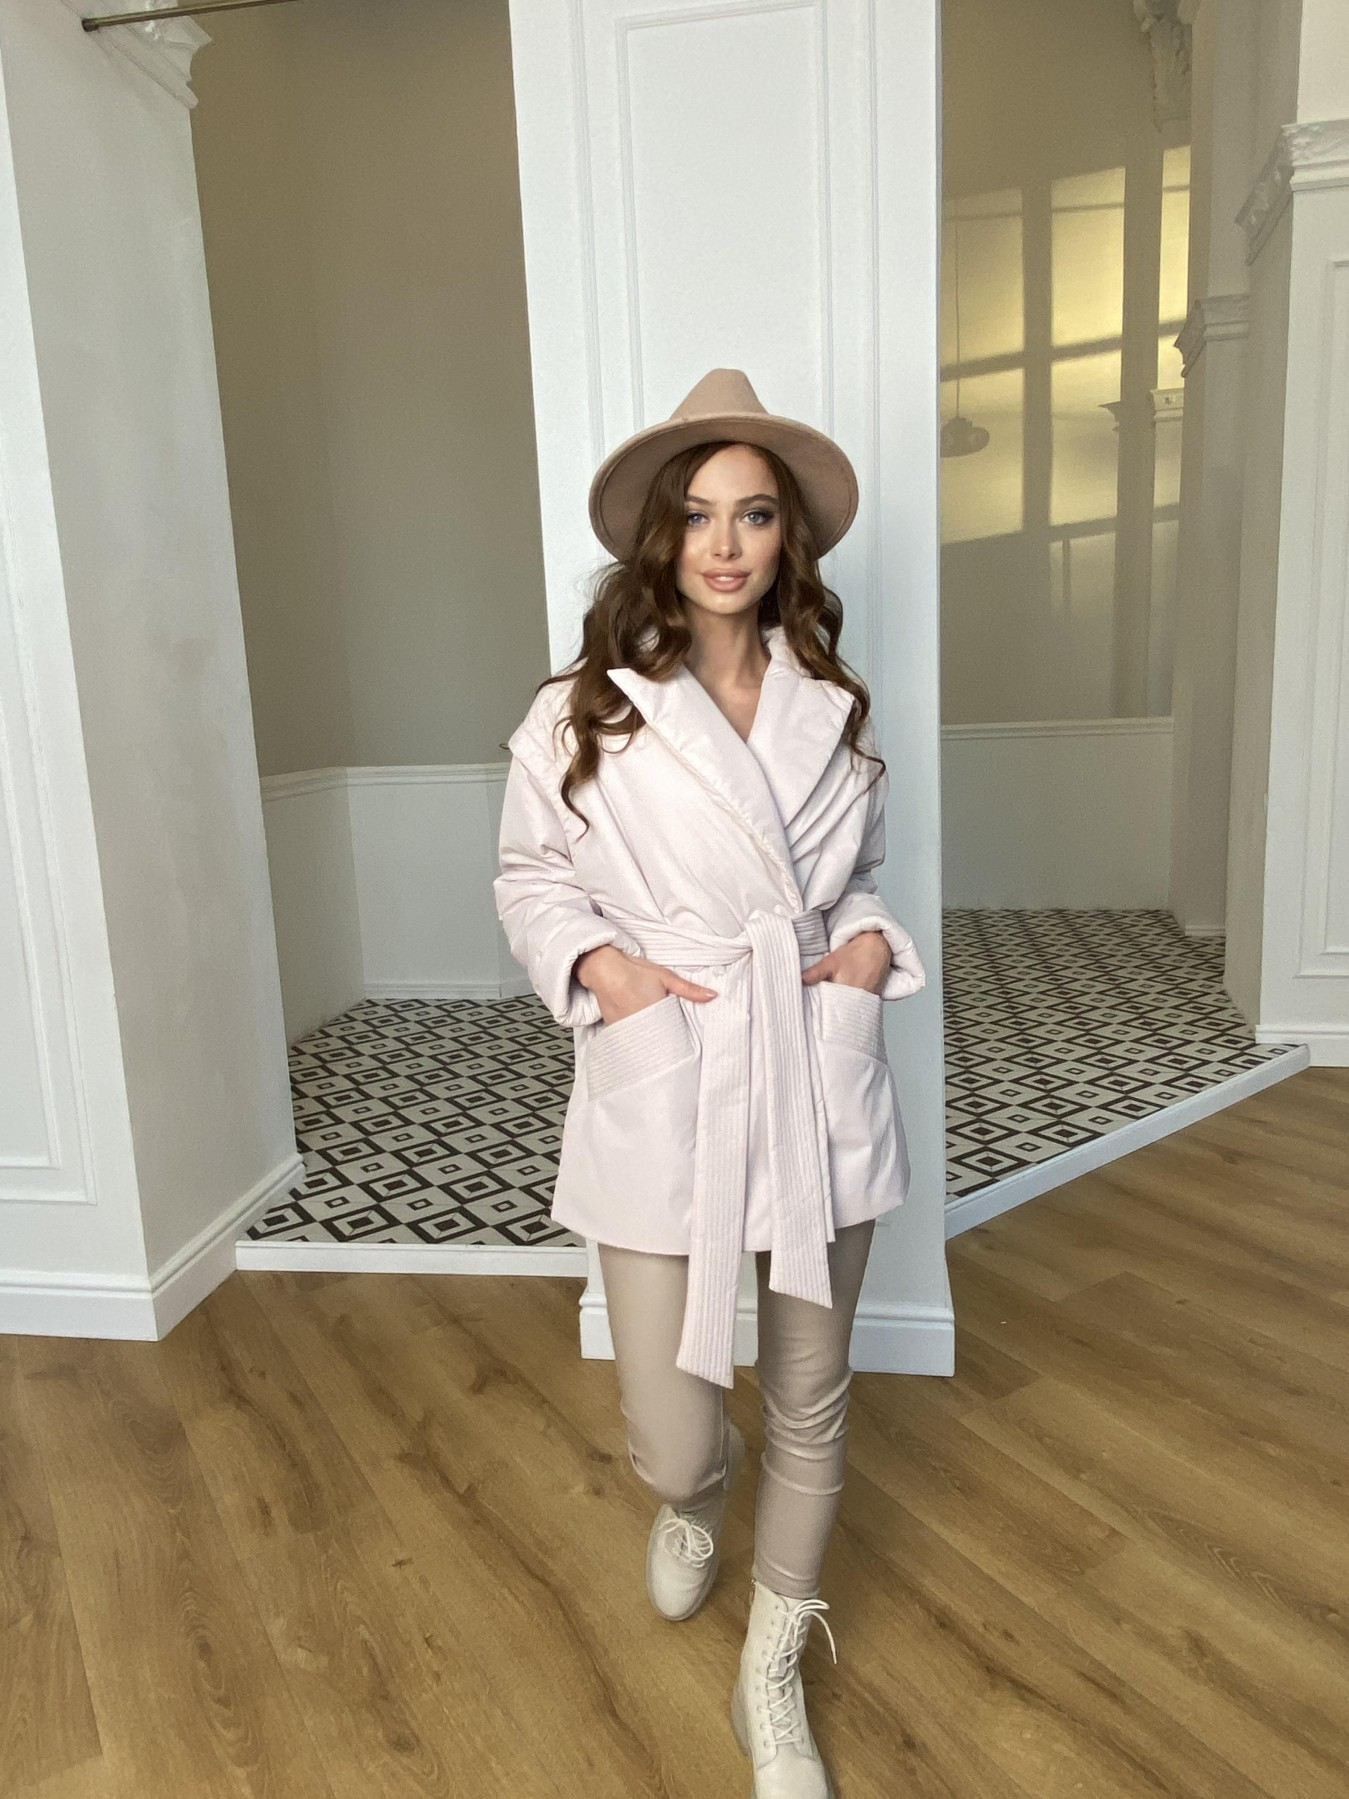 Форбс плащевка Ammy куртка 10817 АРТ. 47298 Цвет: Молоко - фото 1, интернет магазин tm-modus.ru